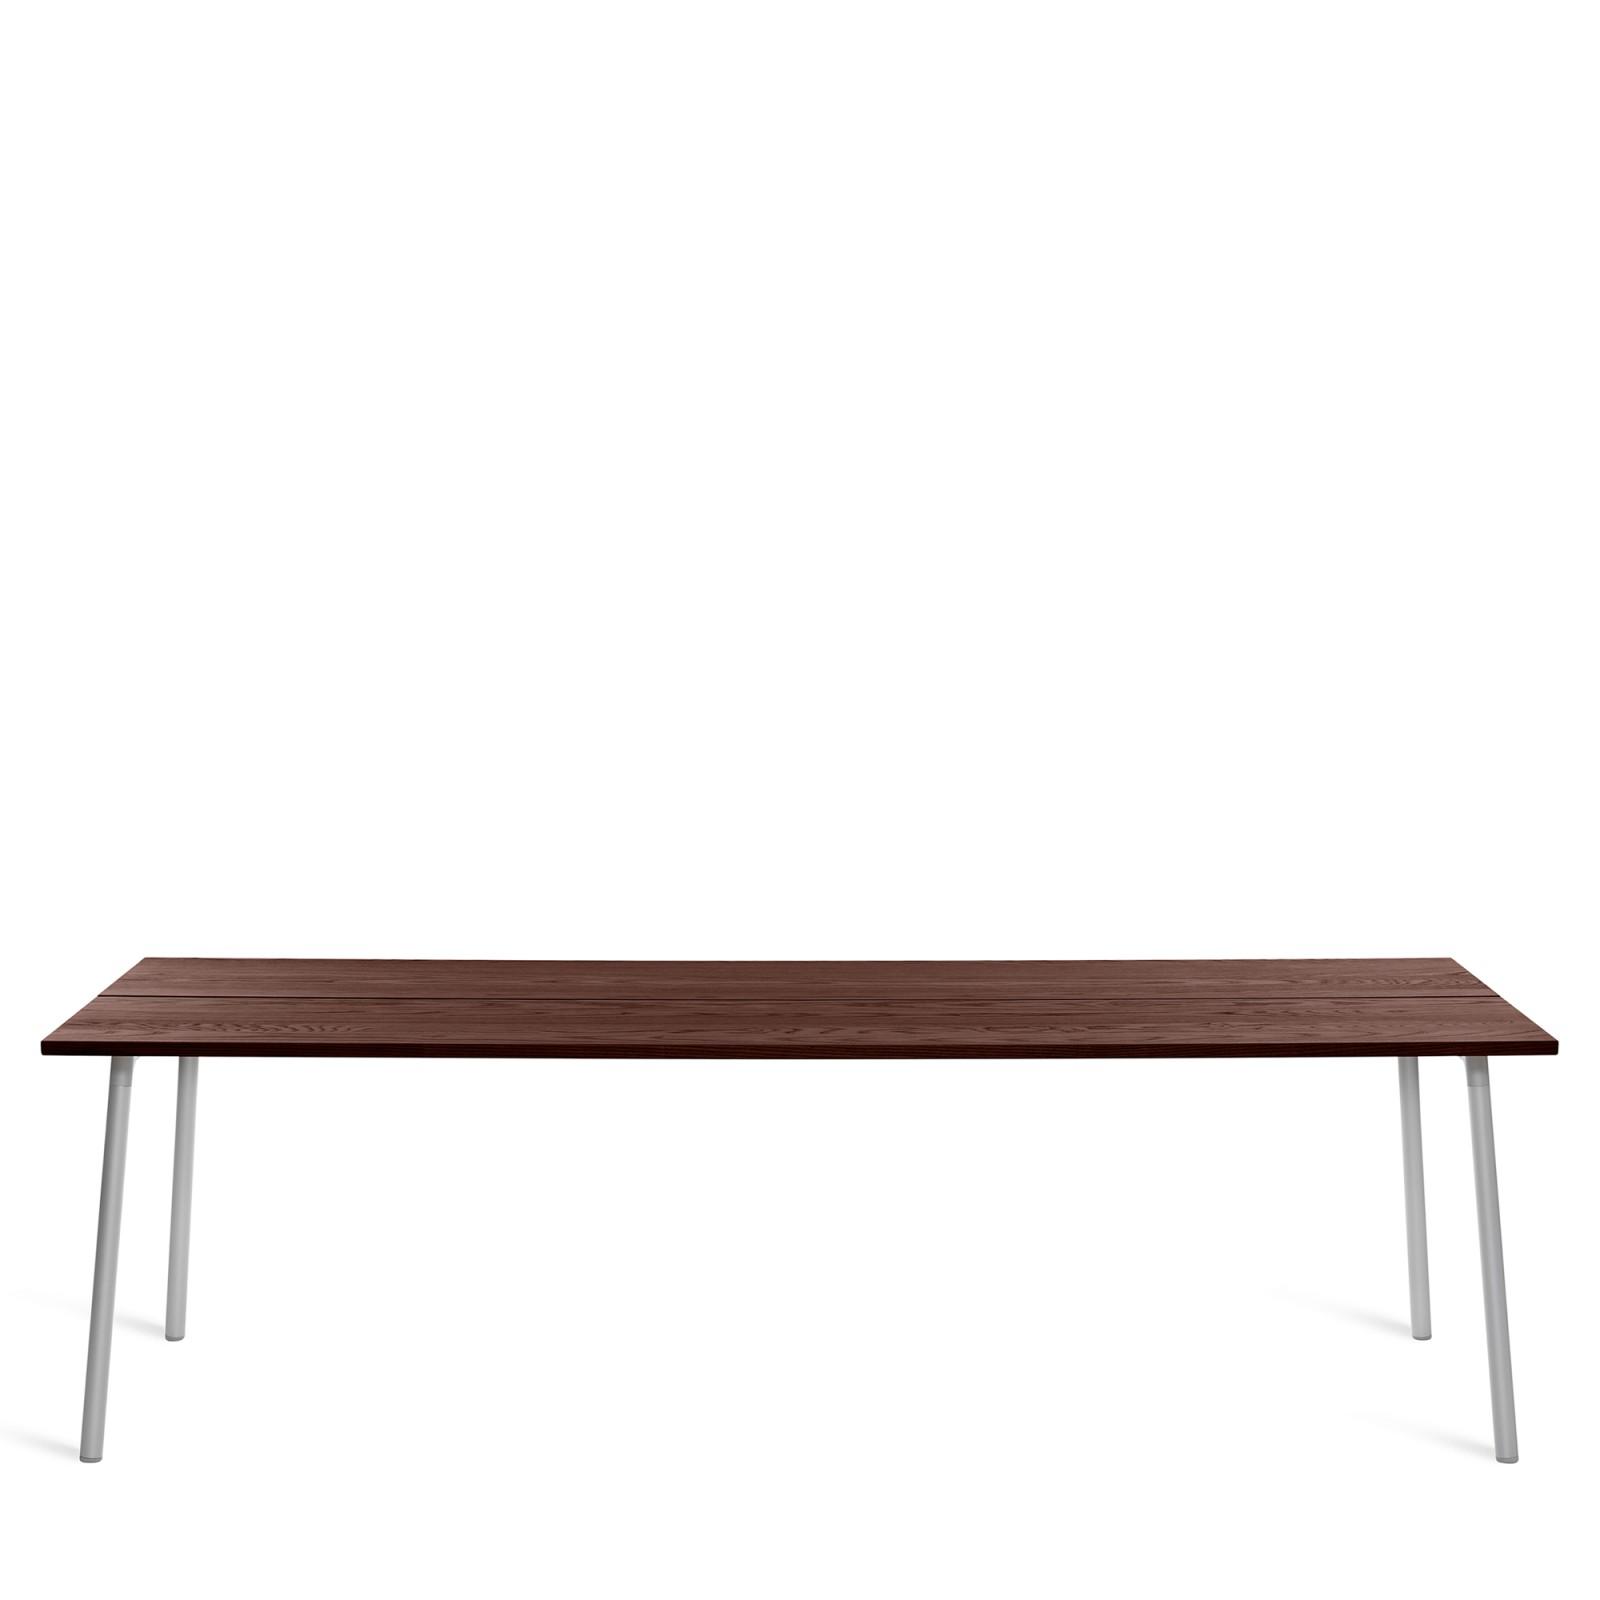 Run Dining Table Rectangular 244cm, Clear Aluminium, Walnut